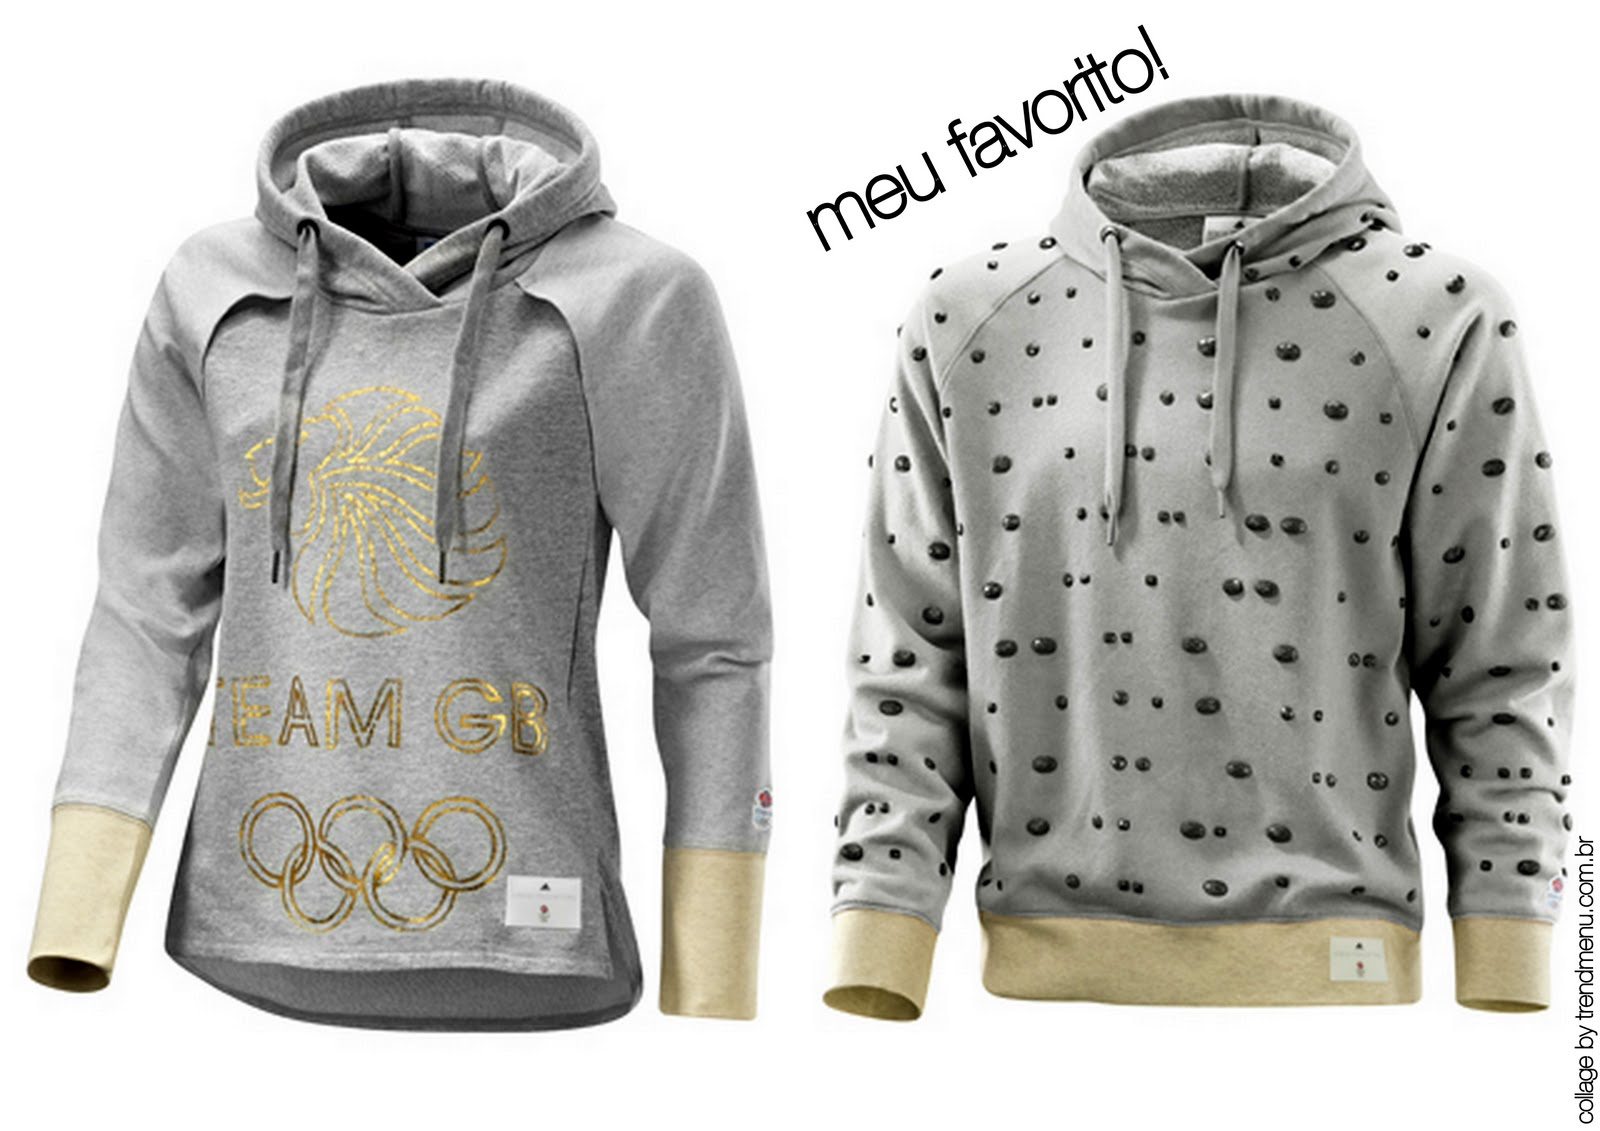 http://1.bp.blogspot.com/-zWf8QGVi4B0/Tcp-tUzPFRI/AAAAAAAAGBk/ohXbEYU0a0M/s1600/stella+mccartney+adidas+team+GB-2.jpg